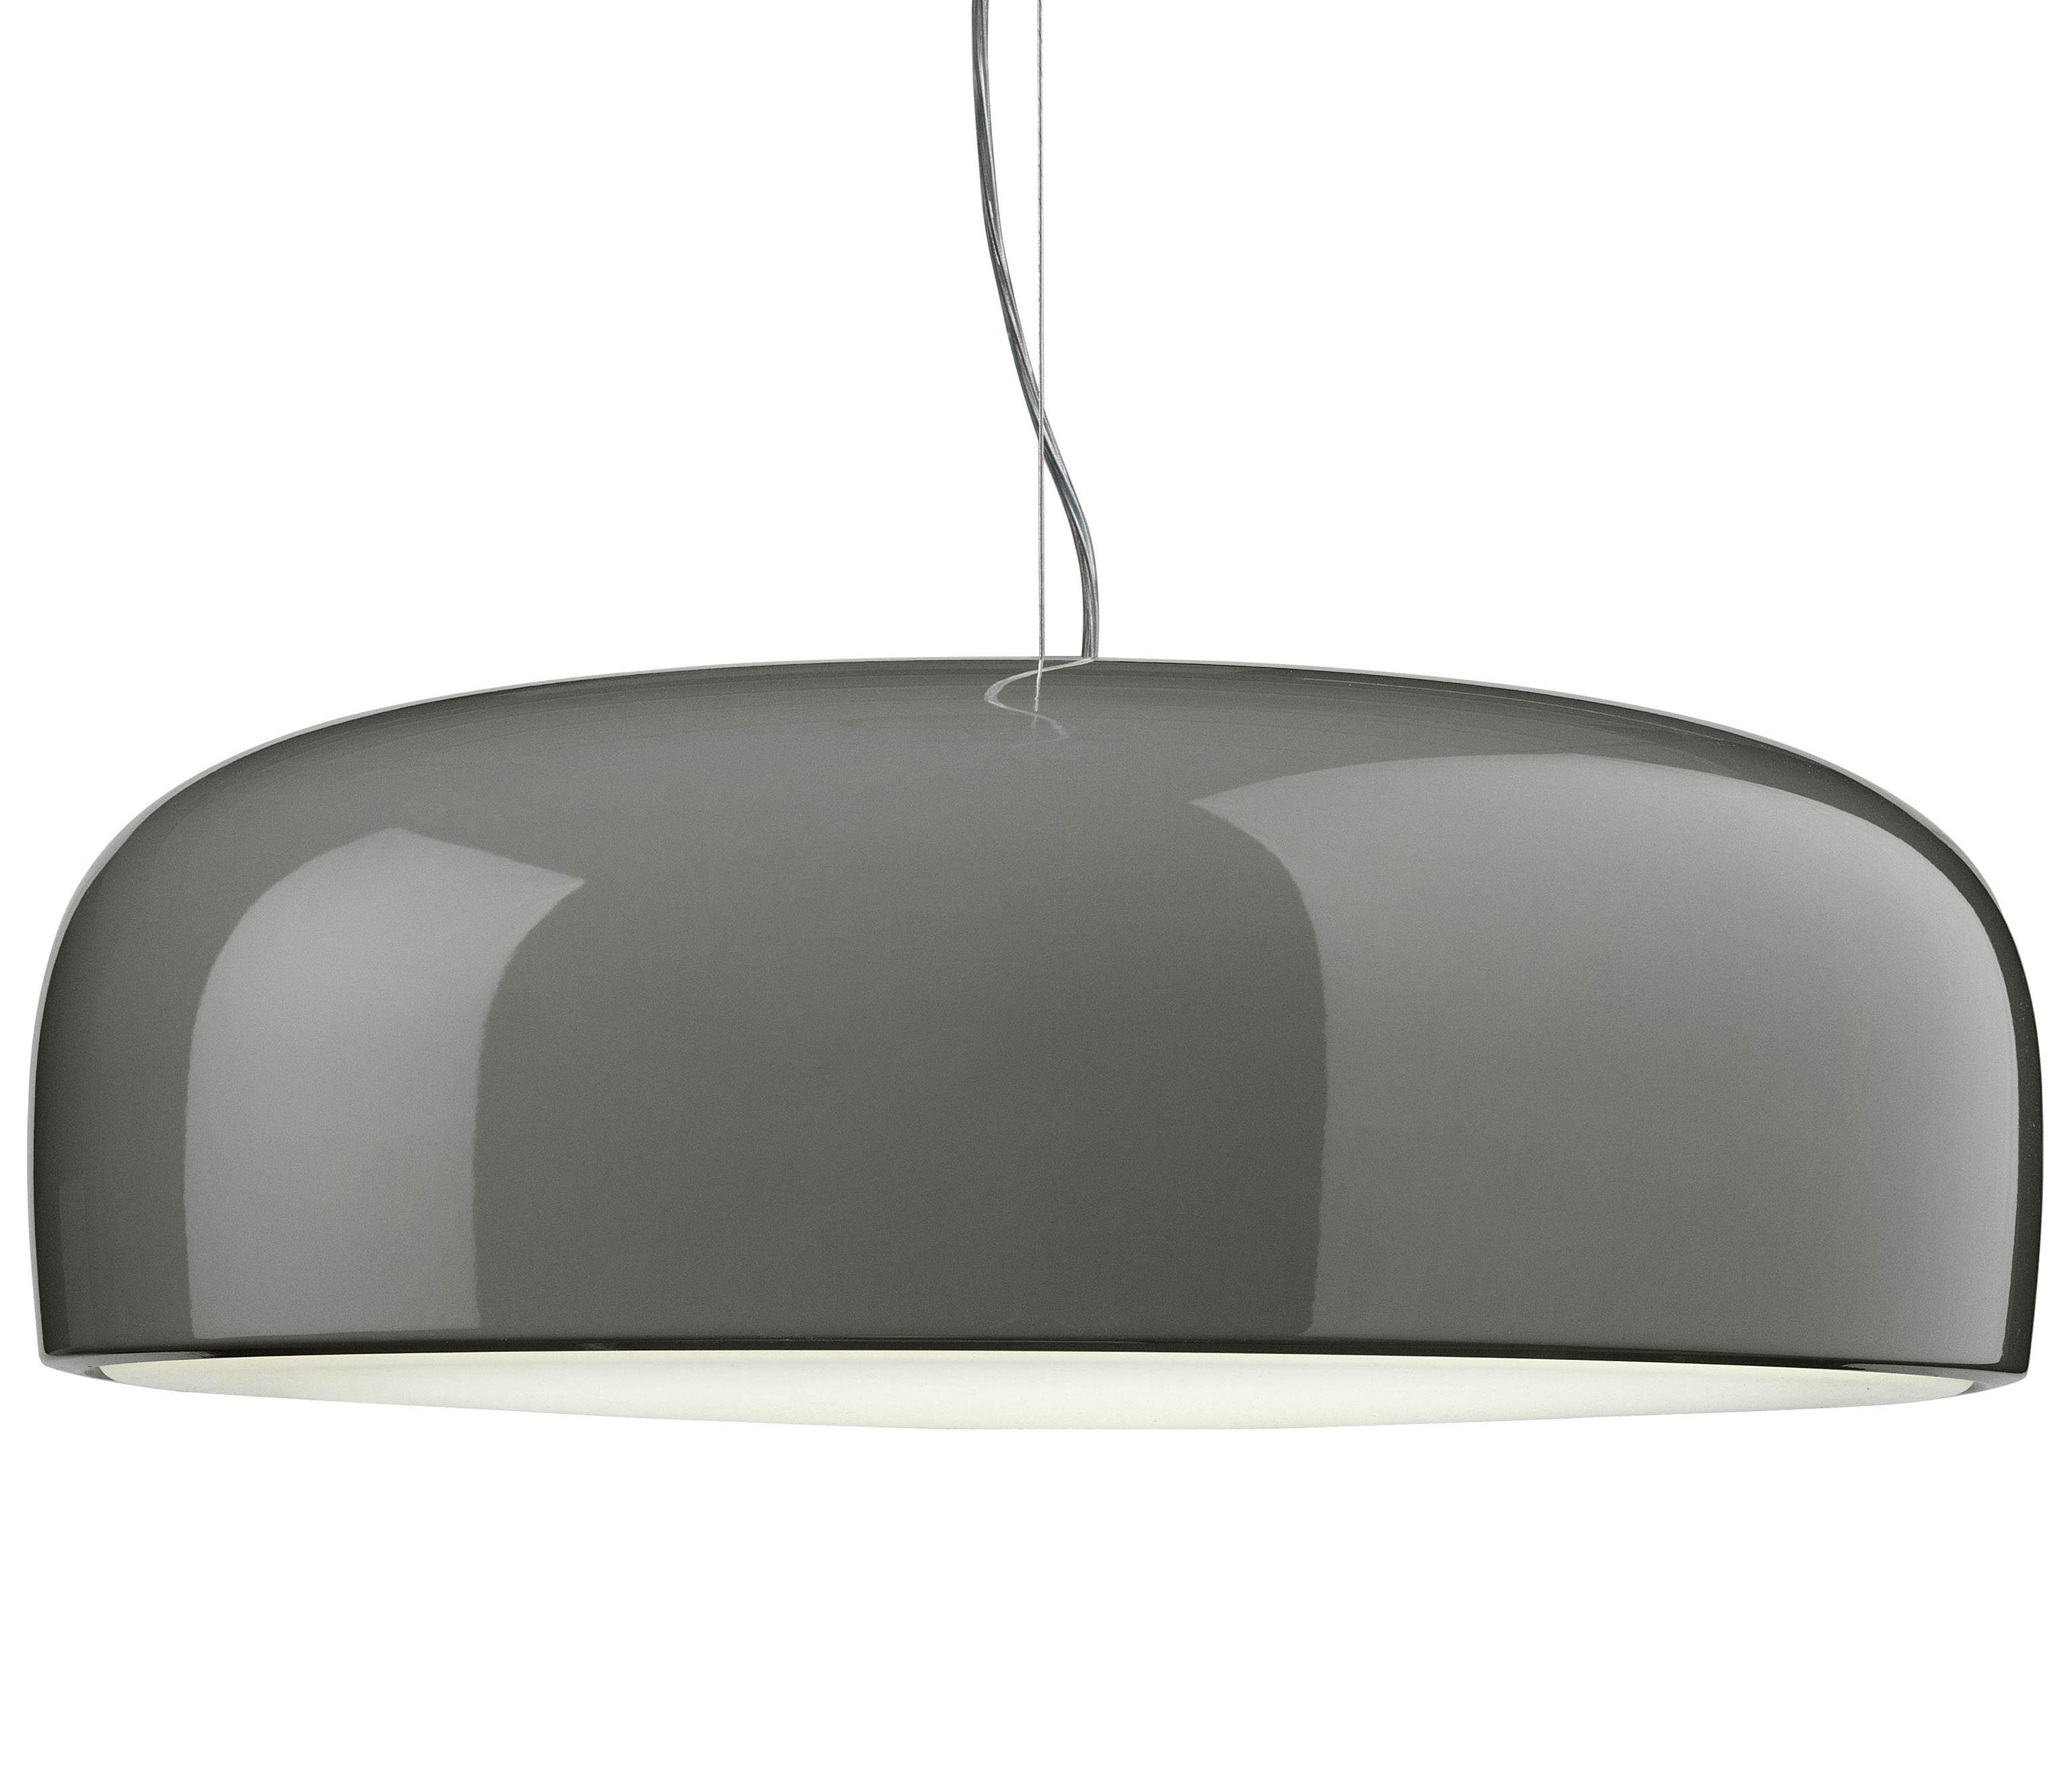 Leuchten - Pendelleuchten - Smithfield Pro Pendelleuchte - Flos - Halogenlampe - Grau-taupe - bemaltes Aluminium, Polykarbonat